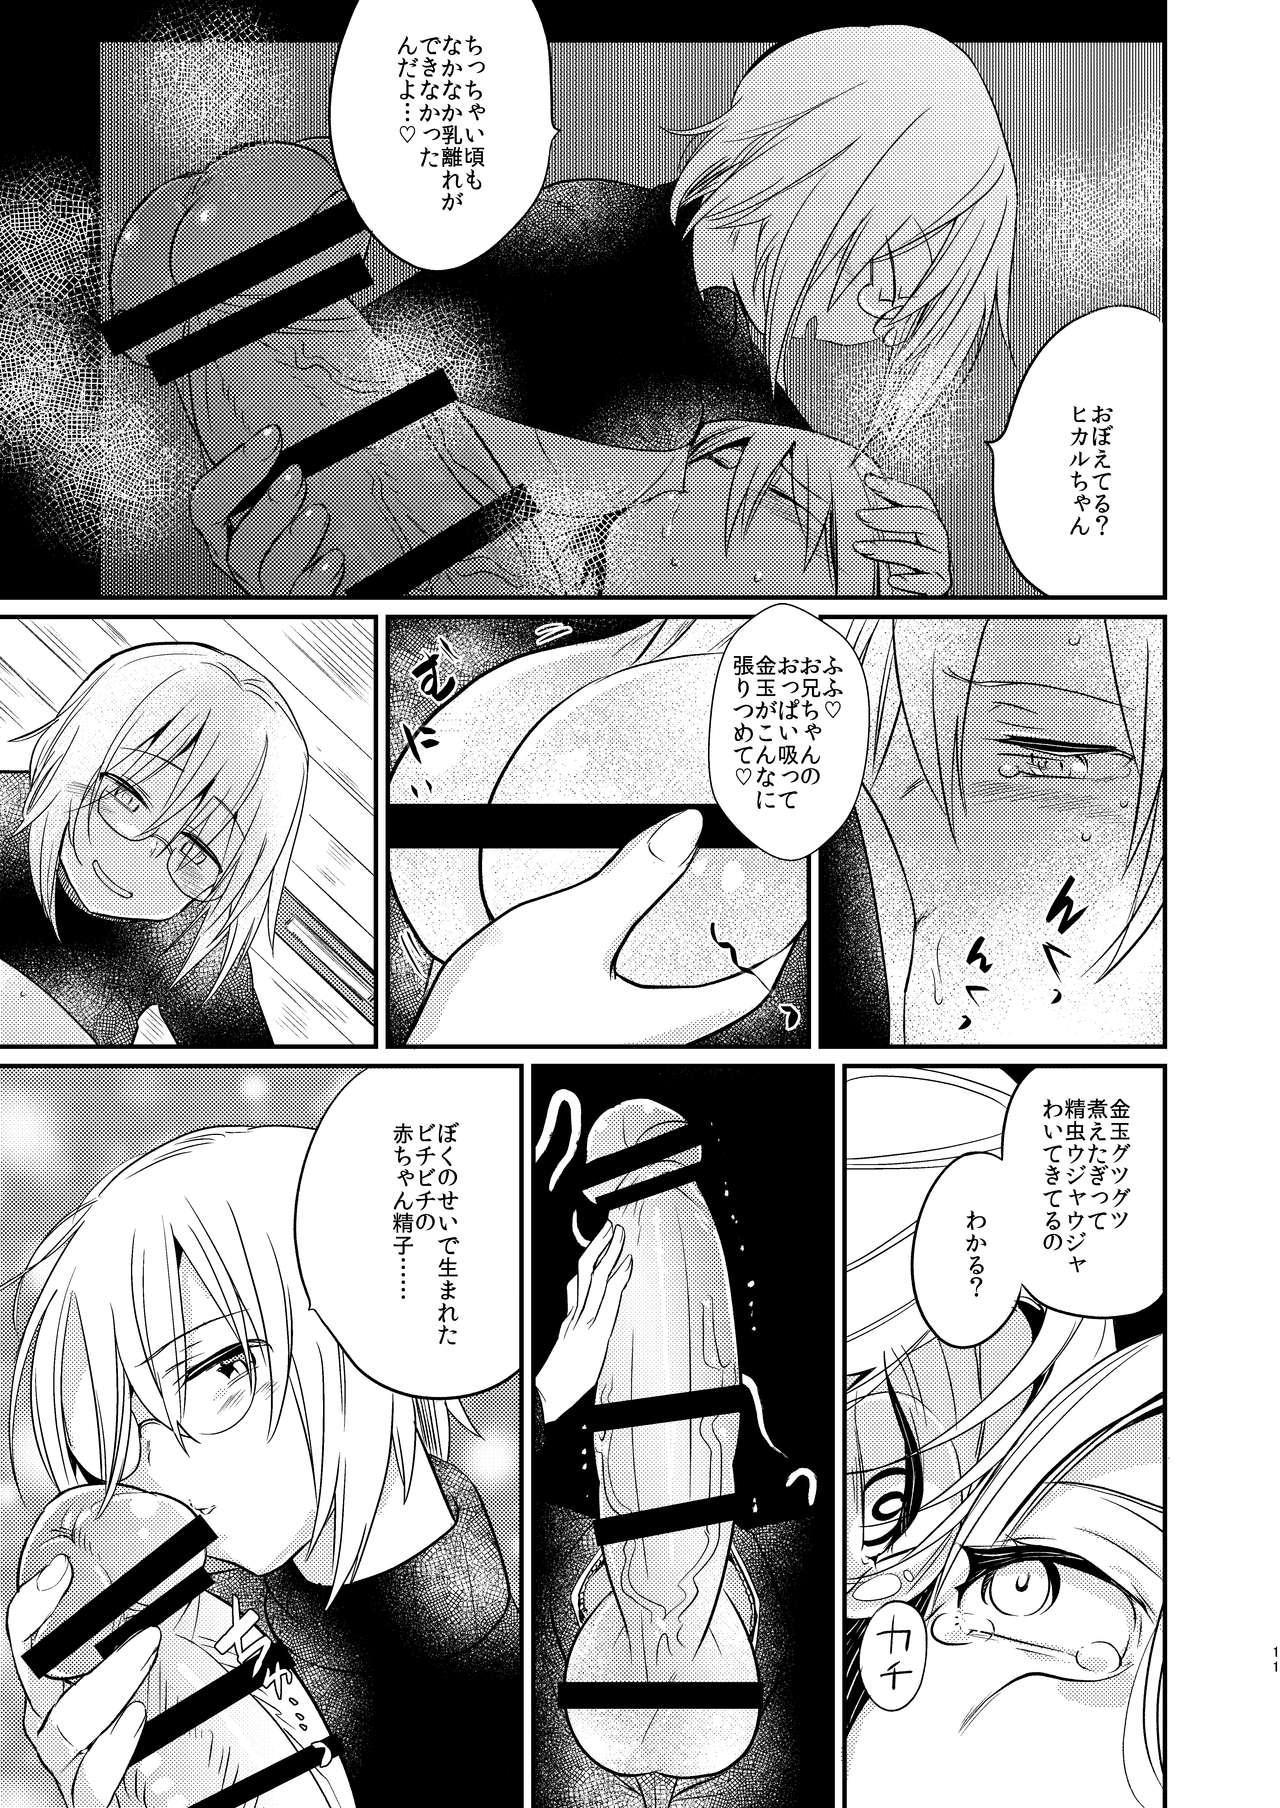 [TETRARA (Tokiwa Yutaka)] Ikenai Onii-chan to Ichaicha -Agape- [Digital] 8